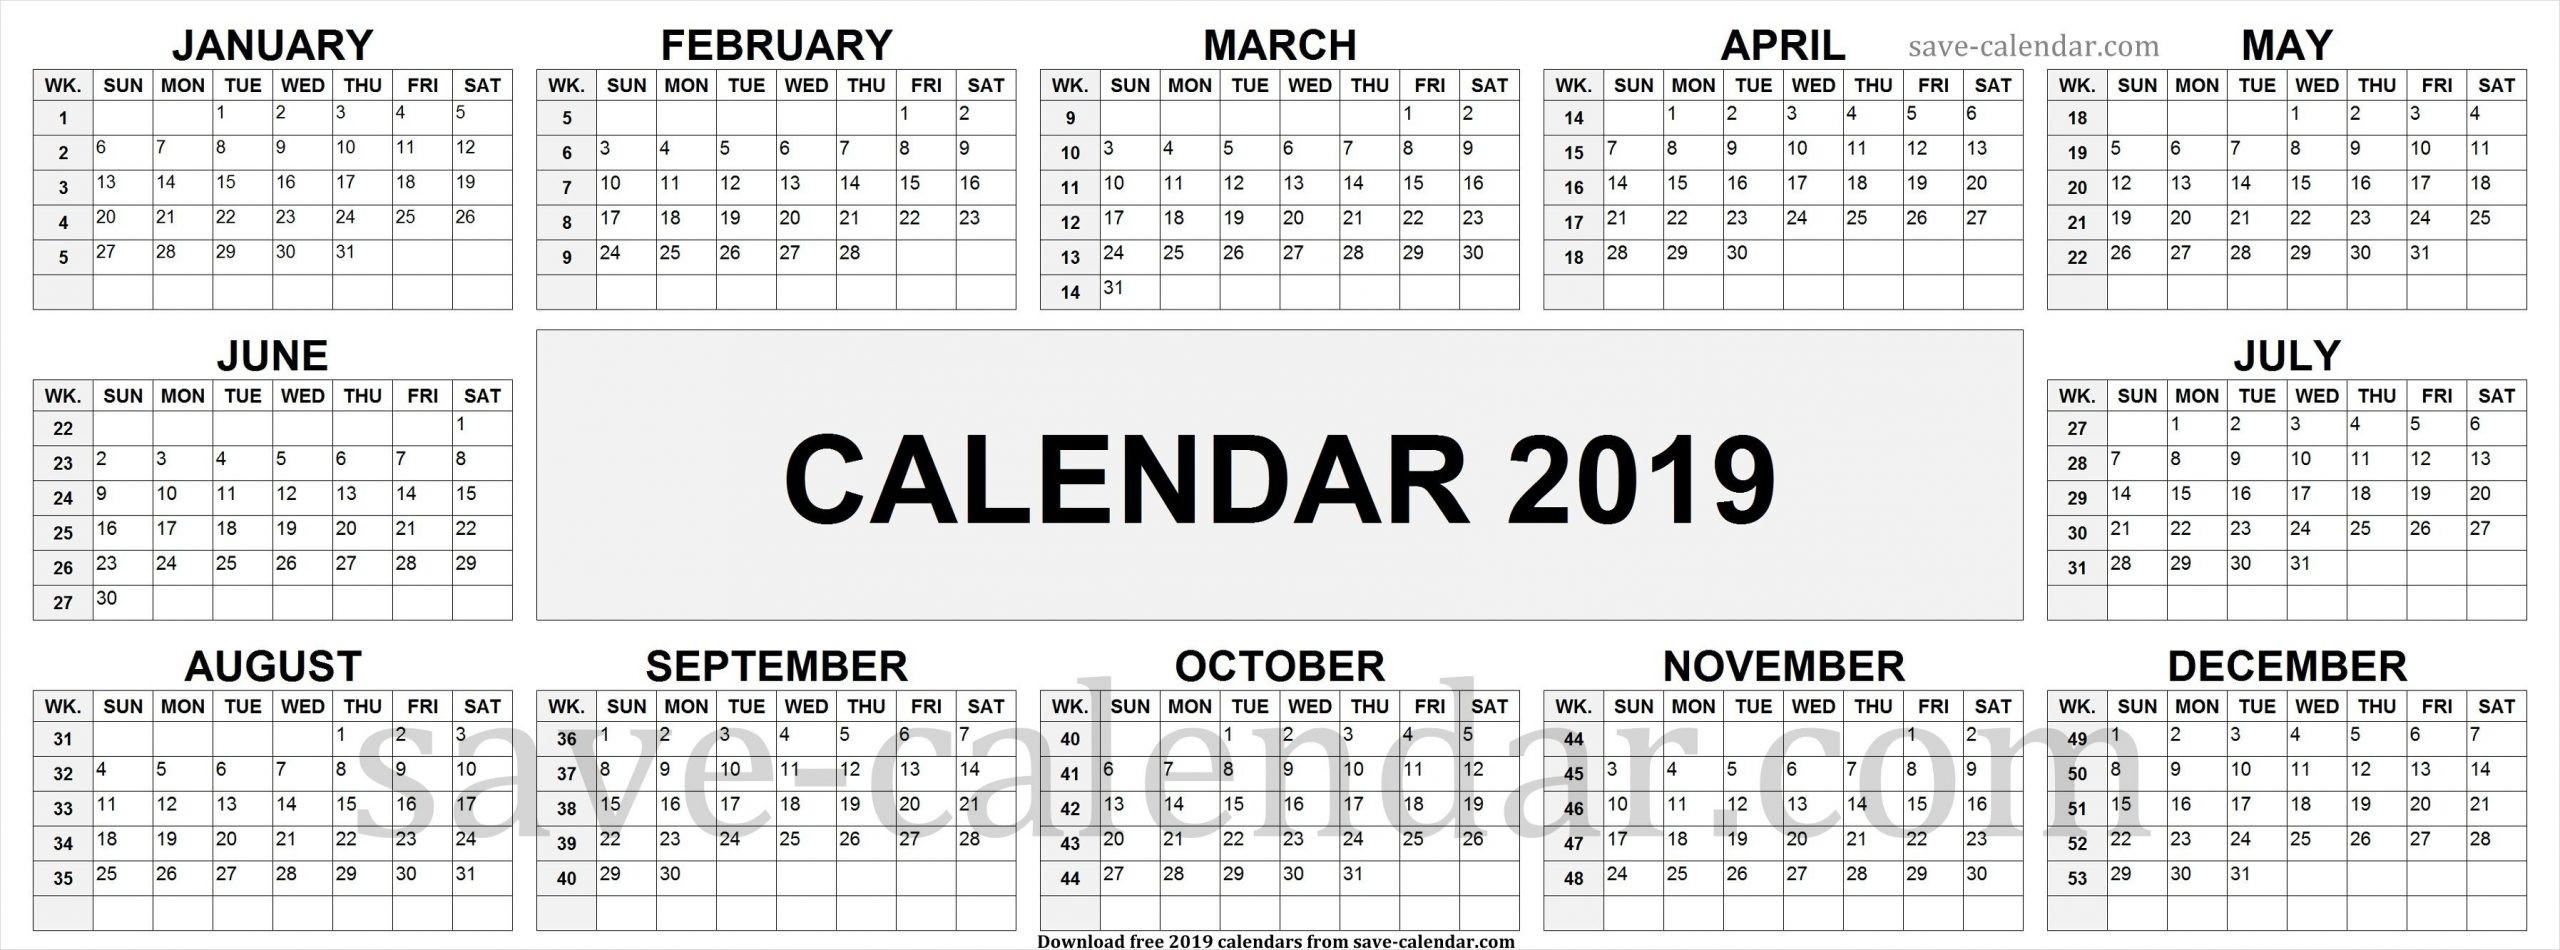 Depo Schedule For 2021 | Calendar Printables Free Blank  Depo Calendar Calculator 2021 2021